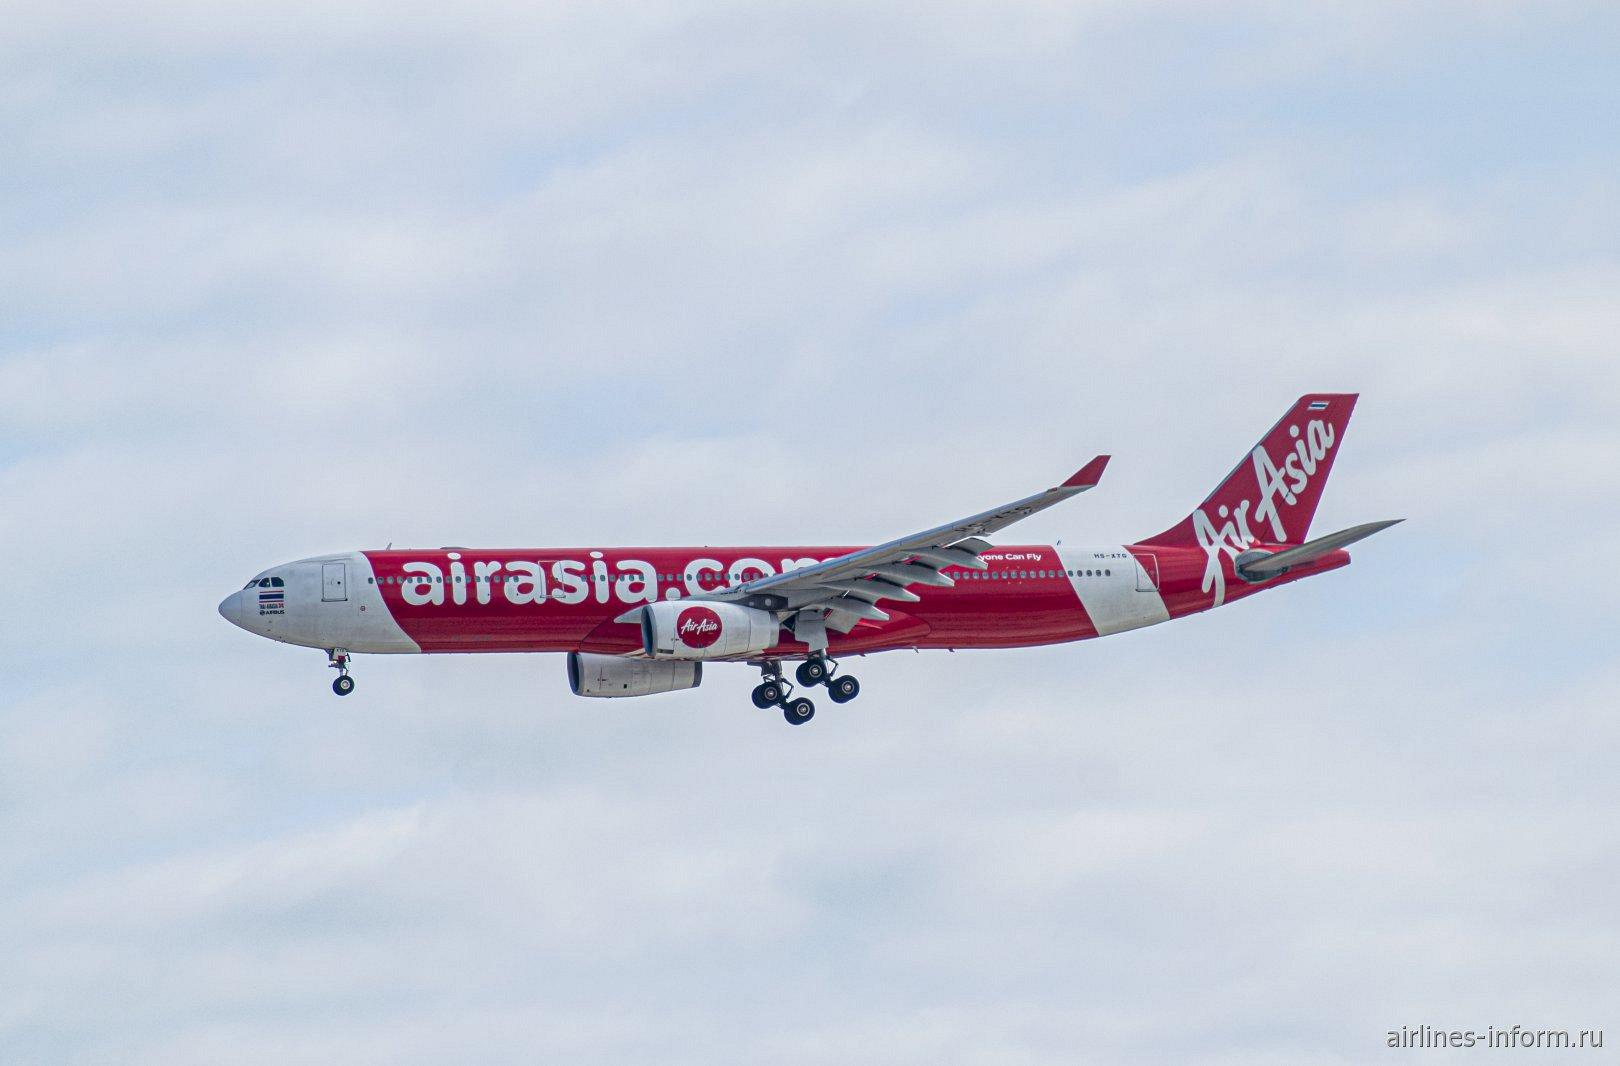 Самолет Airbus A330-300 авиакомпании Thai AirAsia в аэропорту Токио Нарита